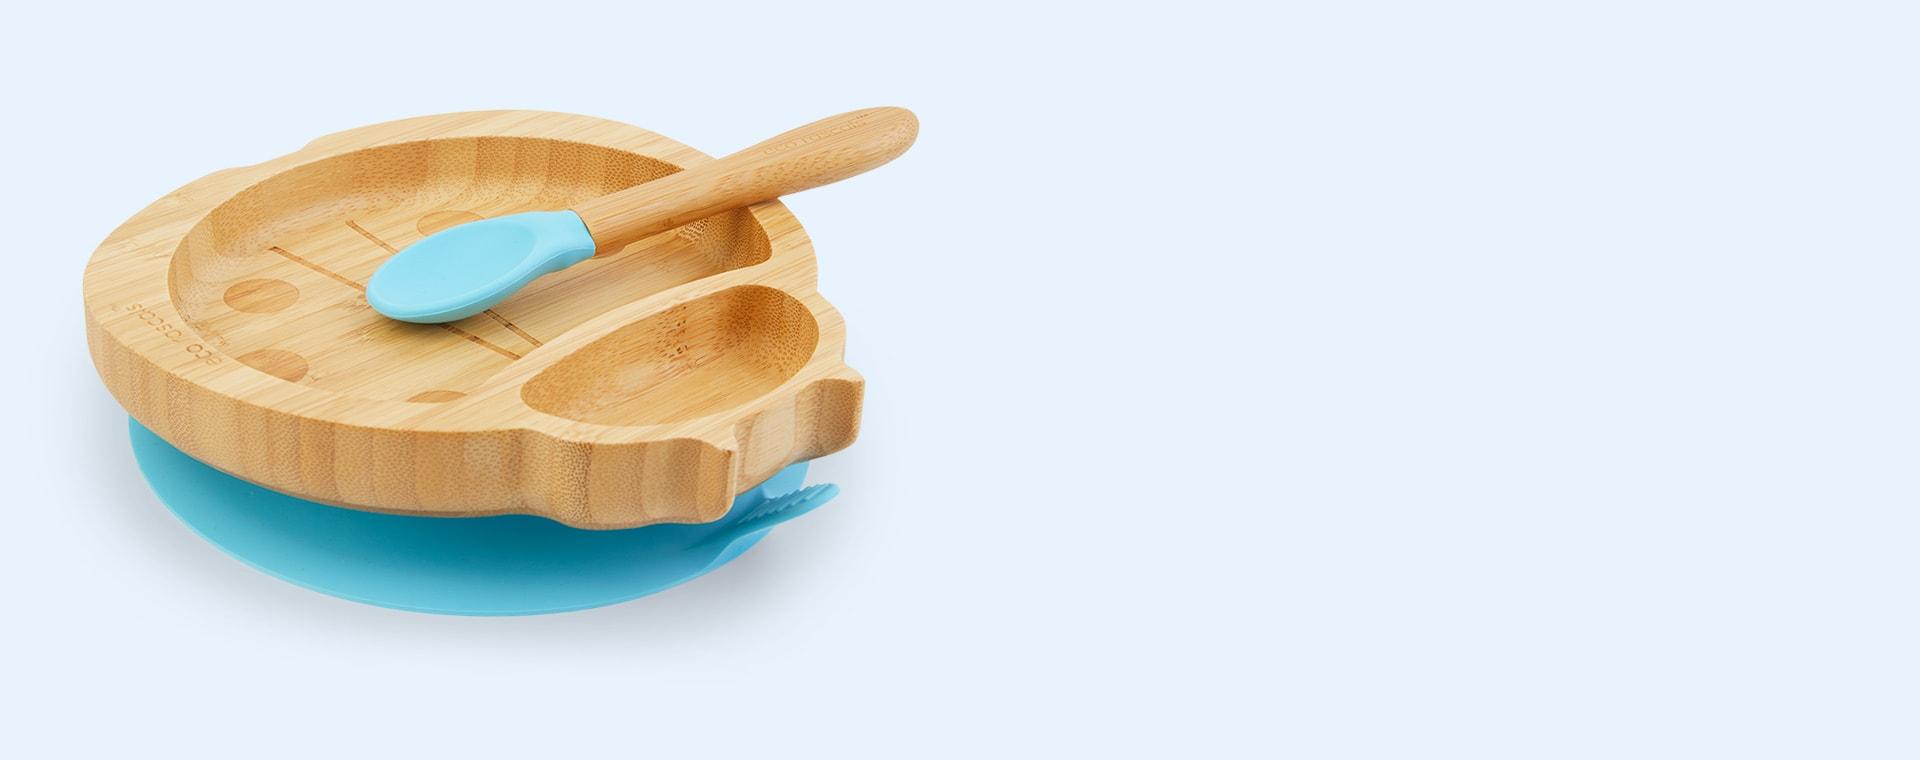 Blue eco rascals Bamboo Suction Ladybird Tableware Set